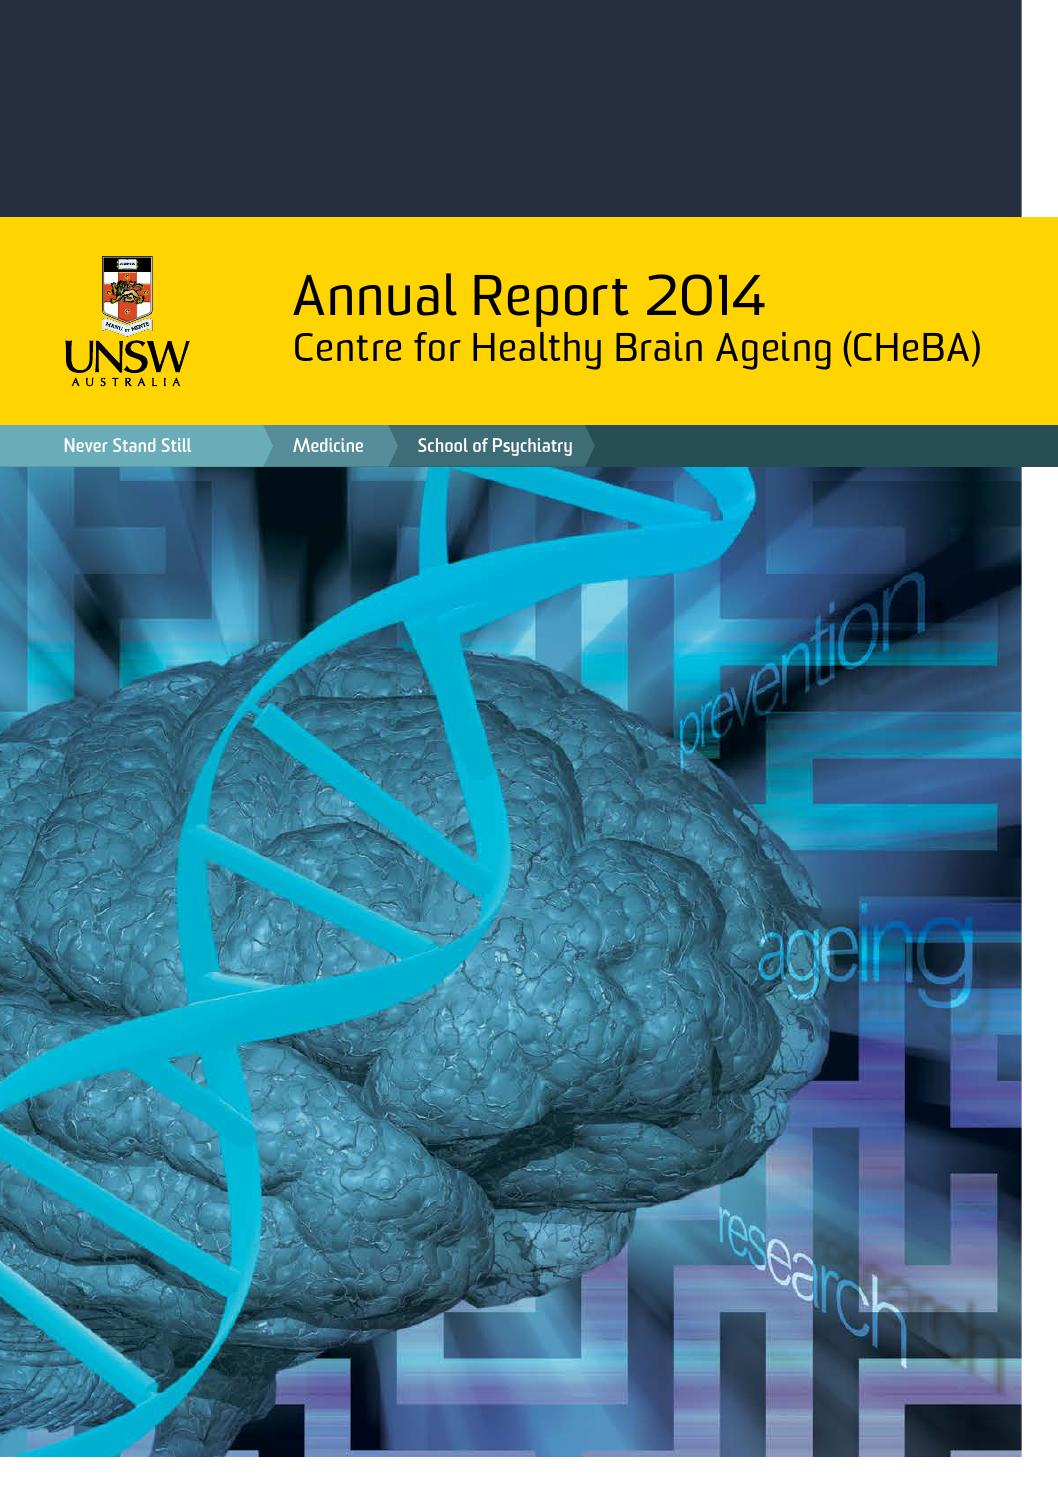 CHeBA Annual Report 2014 by CHeBA - issuu